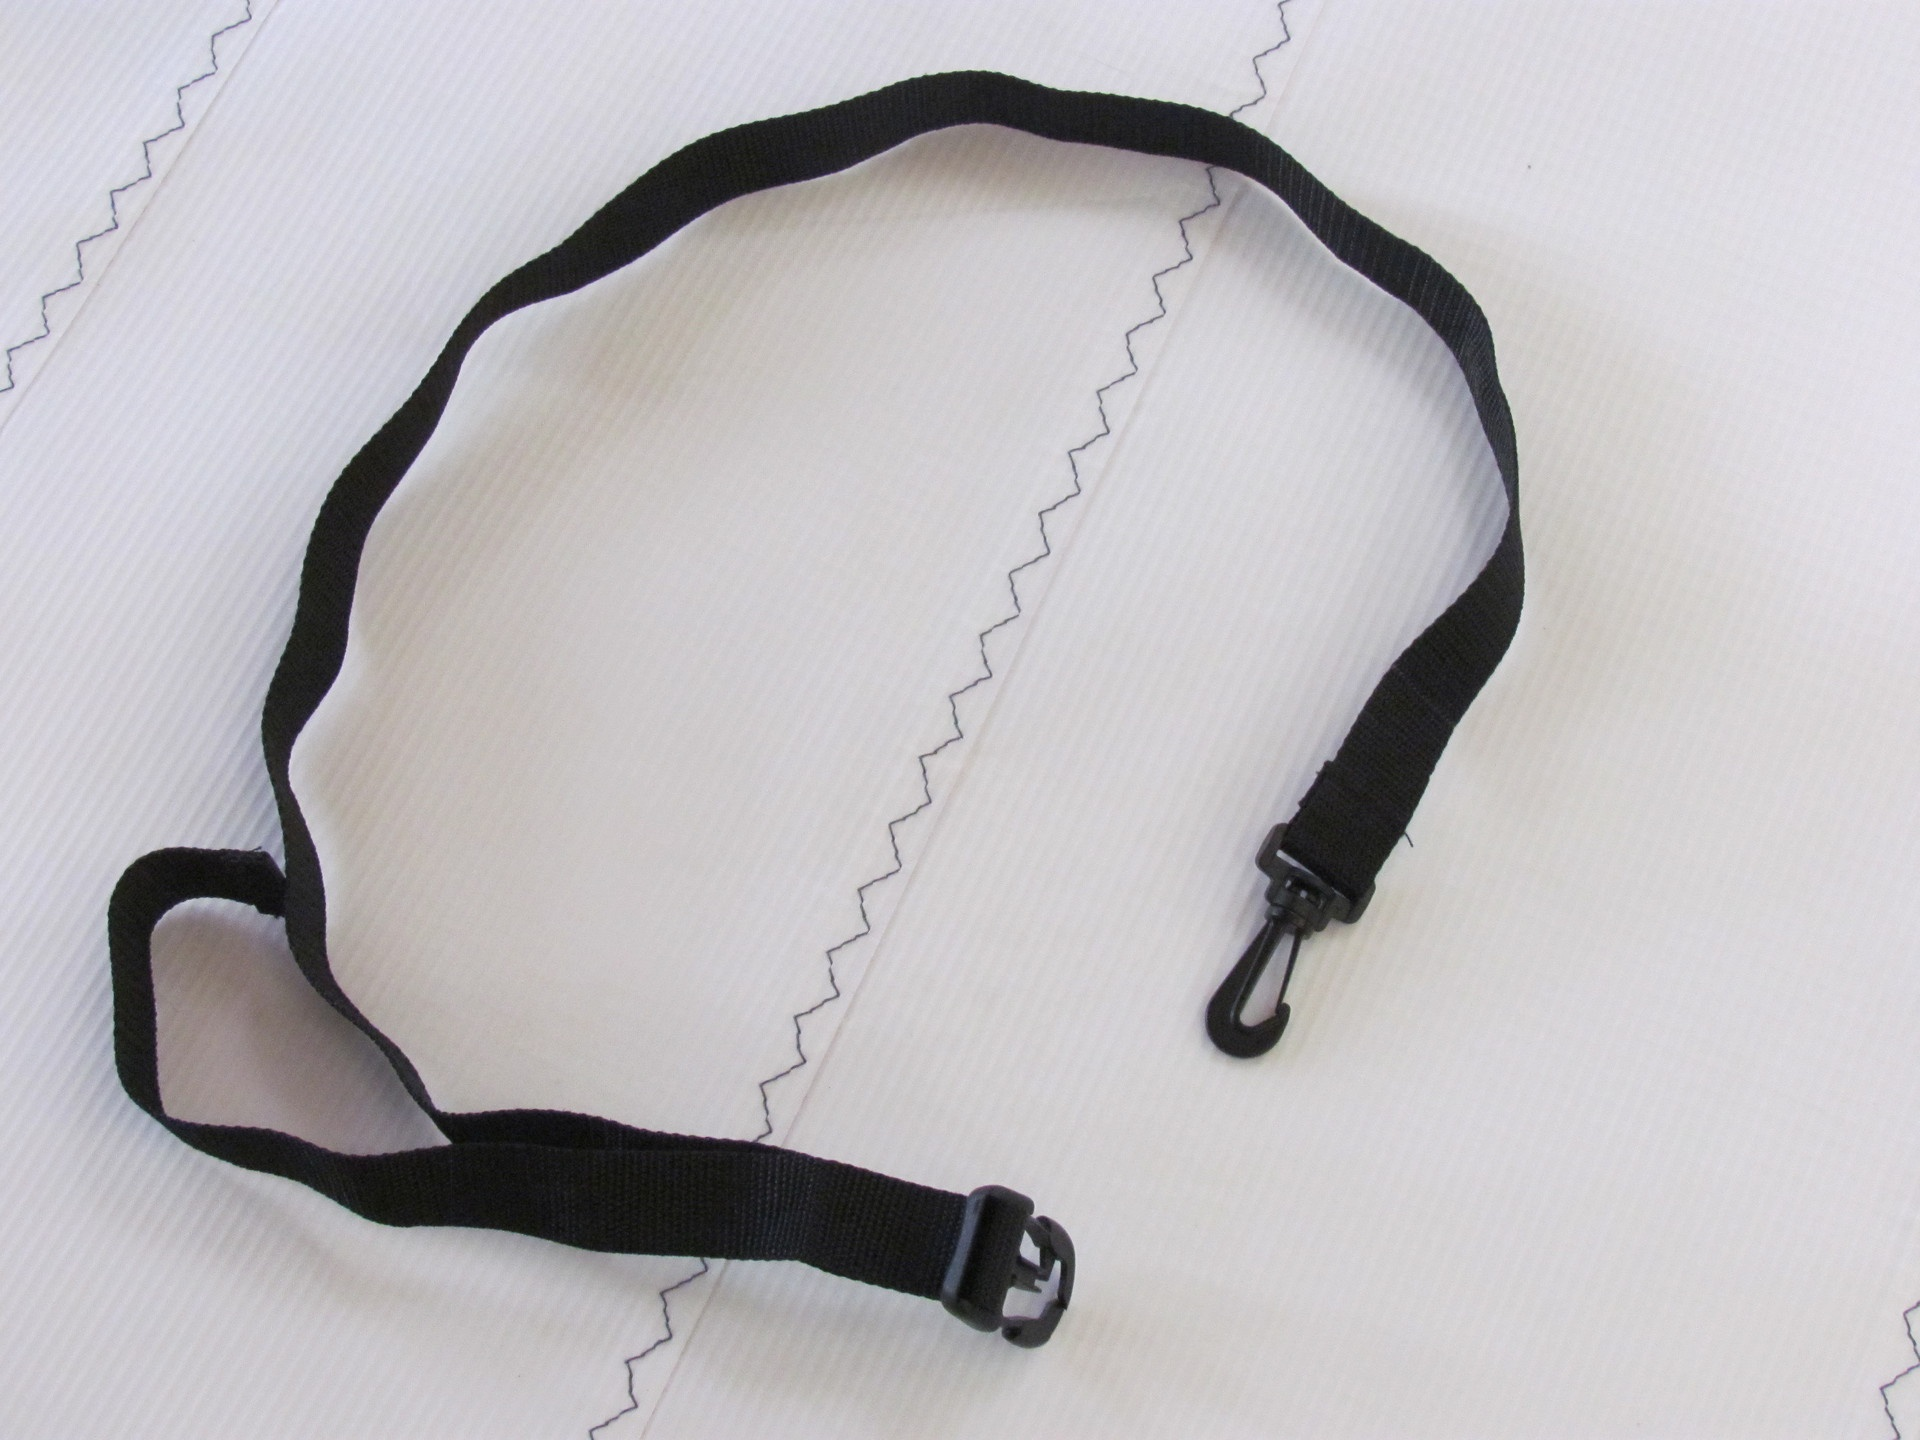 Crutch Strap T/S Inflatable Lifejacket